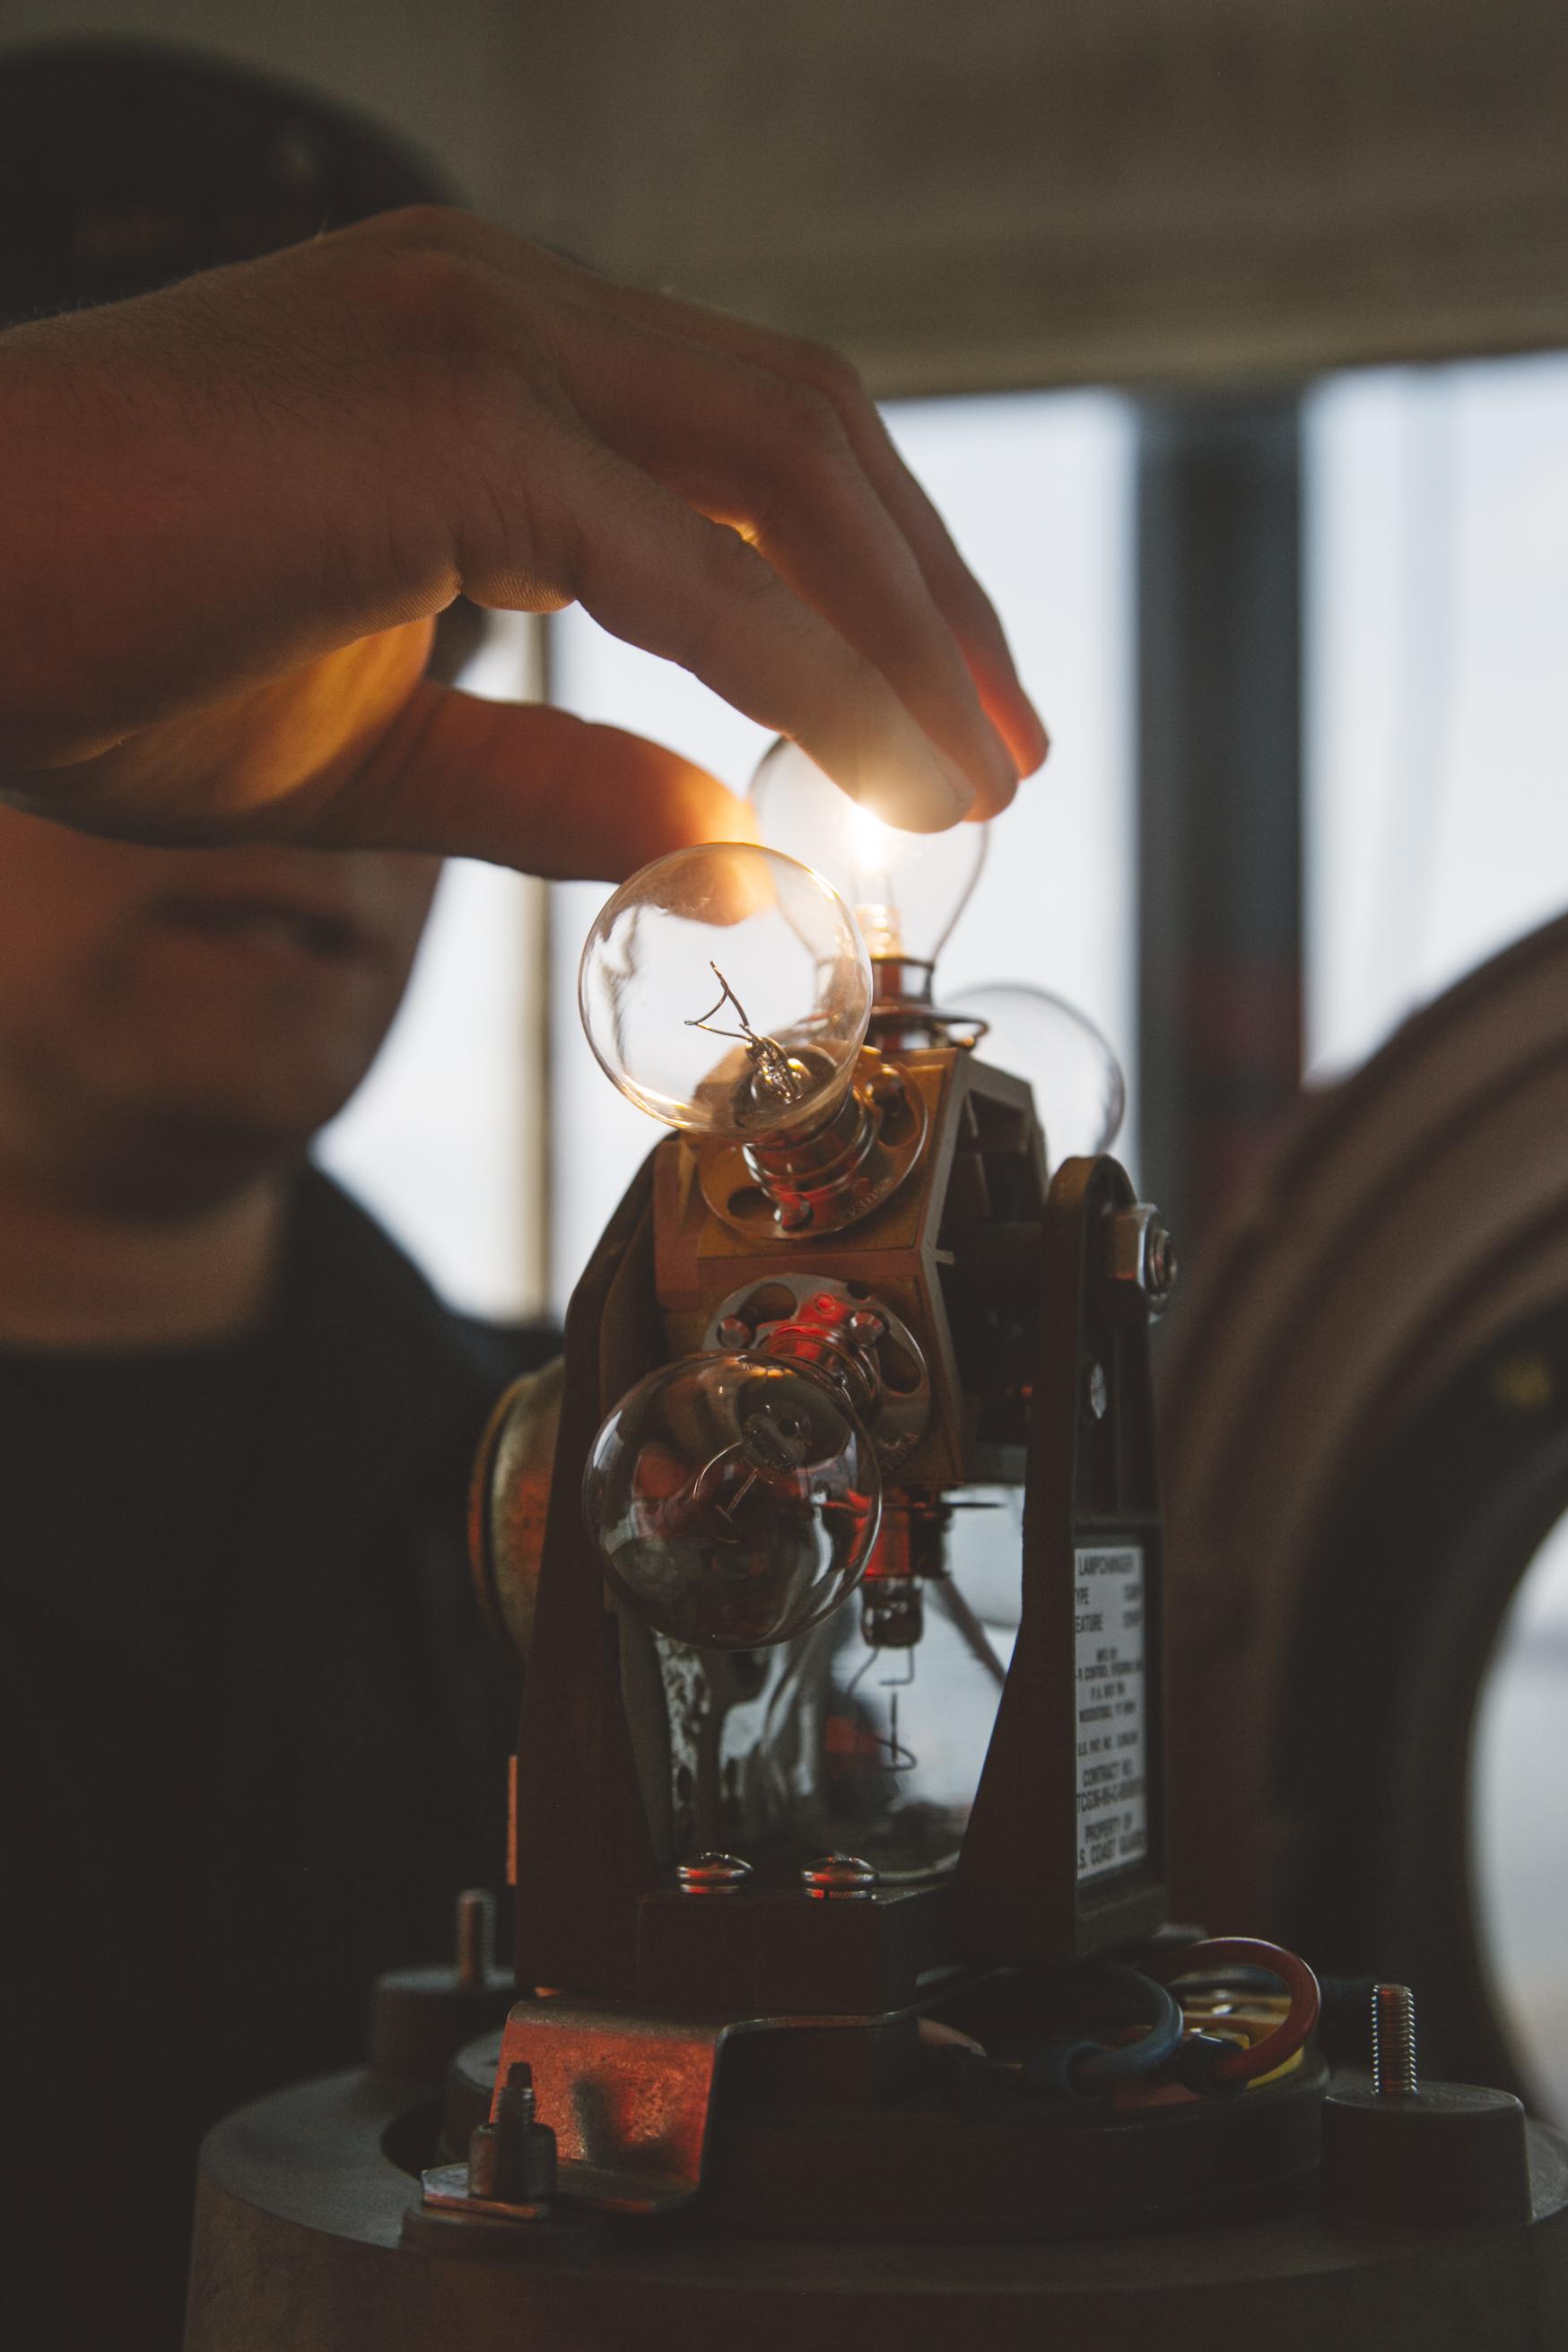 Em1 Tony Robb fixes a light at Spring Point Ledge Light.        Photo © Jenny Rebecca Nelson